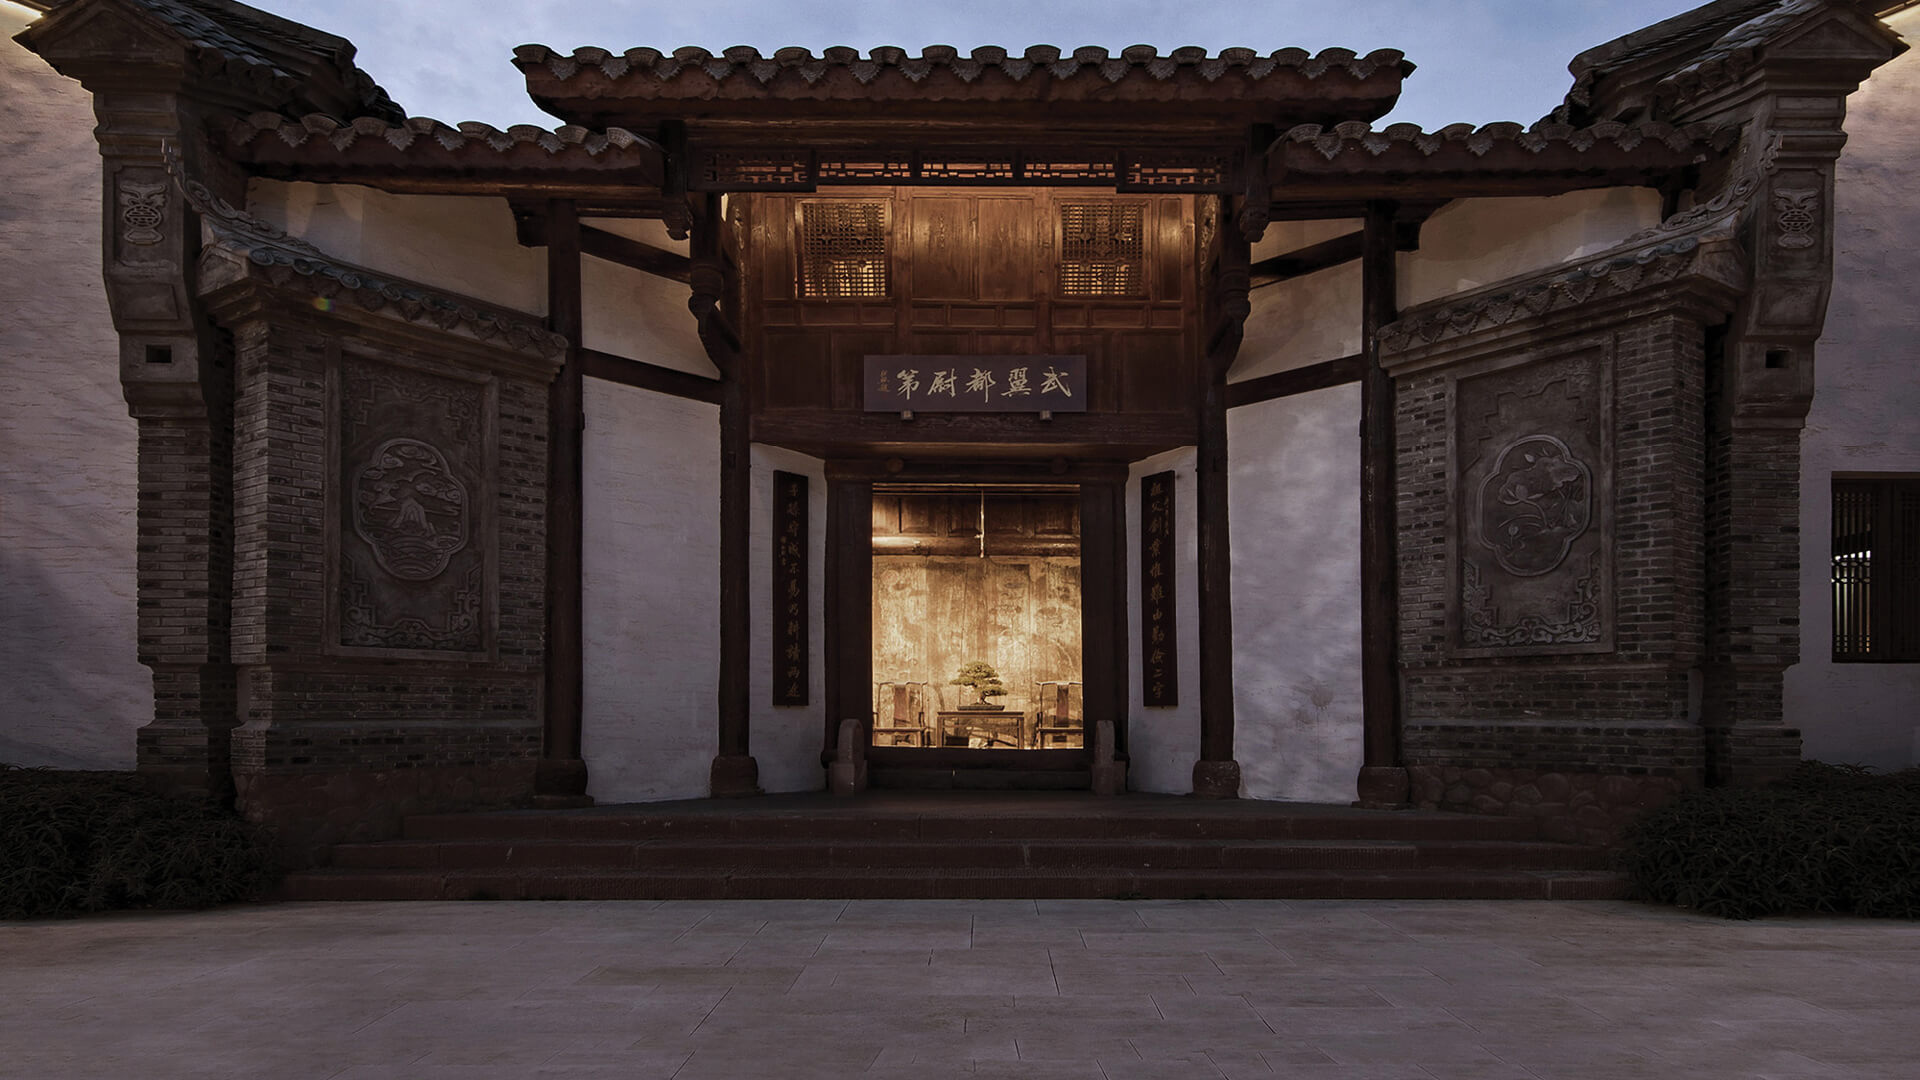 Reclaiming ruins: China Qionghai 17℃ International Tourist Resort by IDMatrix